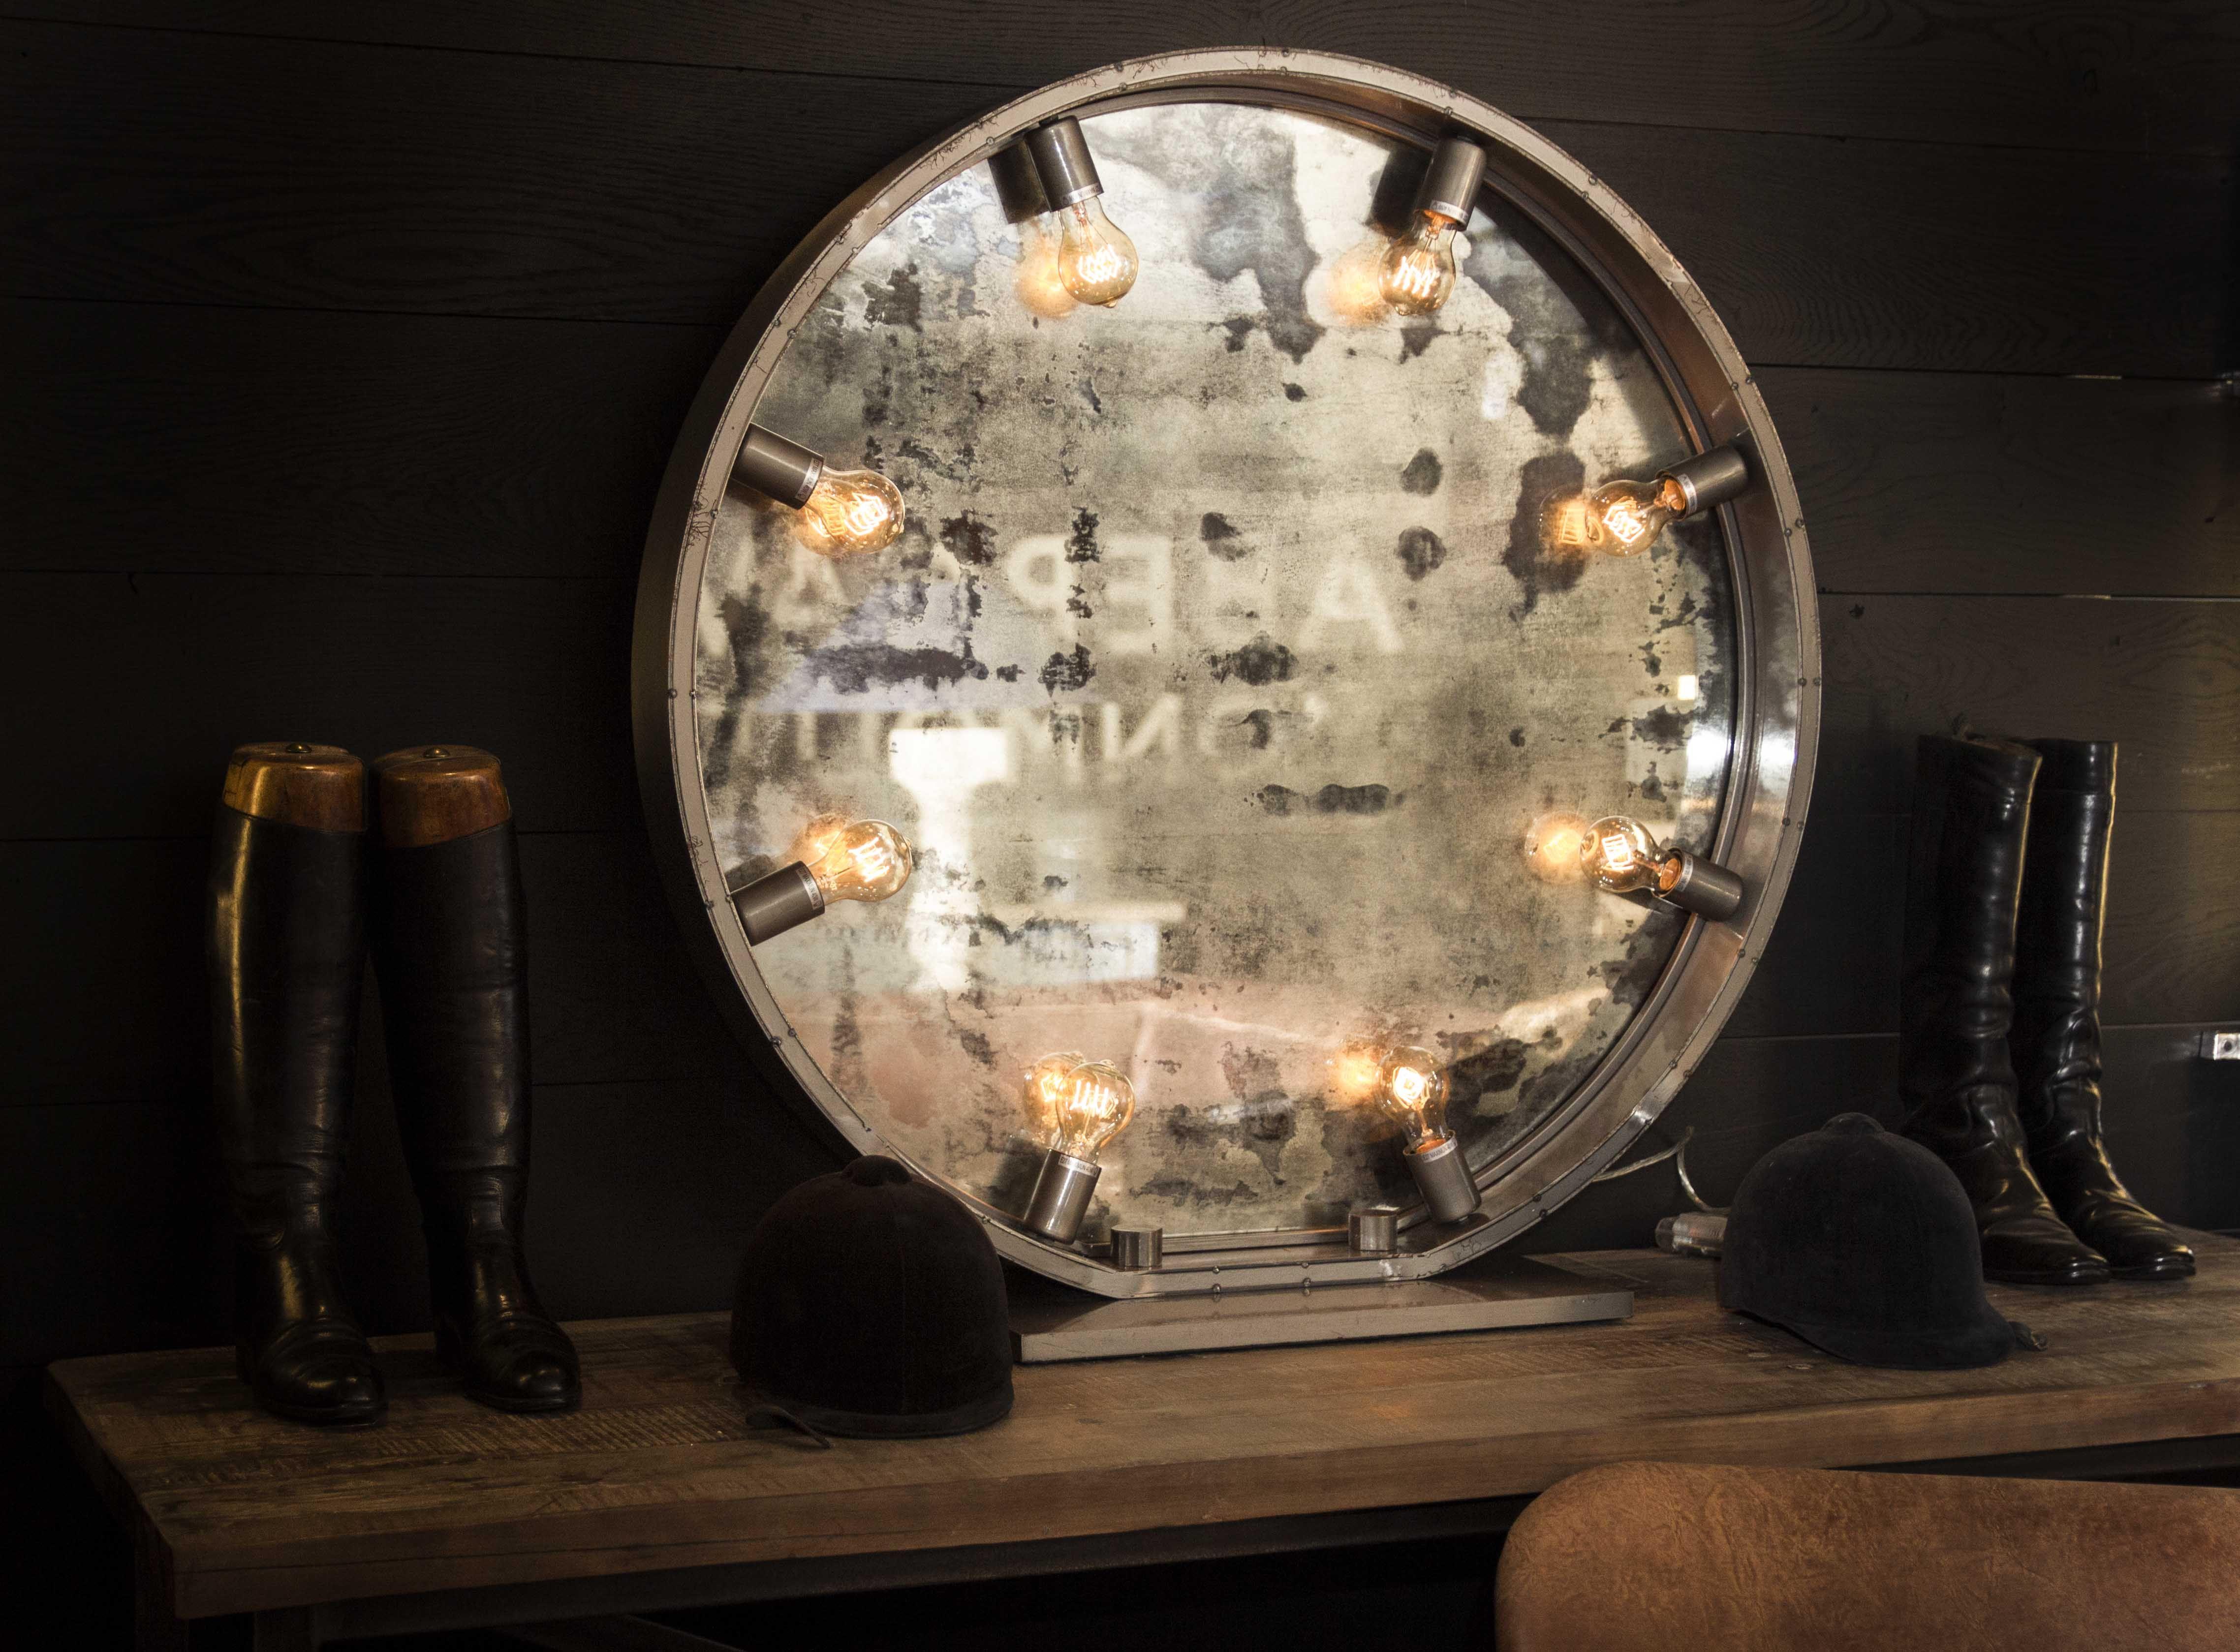 Statement lighting http://www.homesofelegance.co.uk/timothy-oulton-starlet-mirror.html